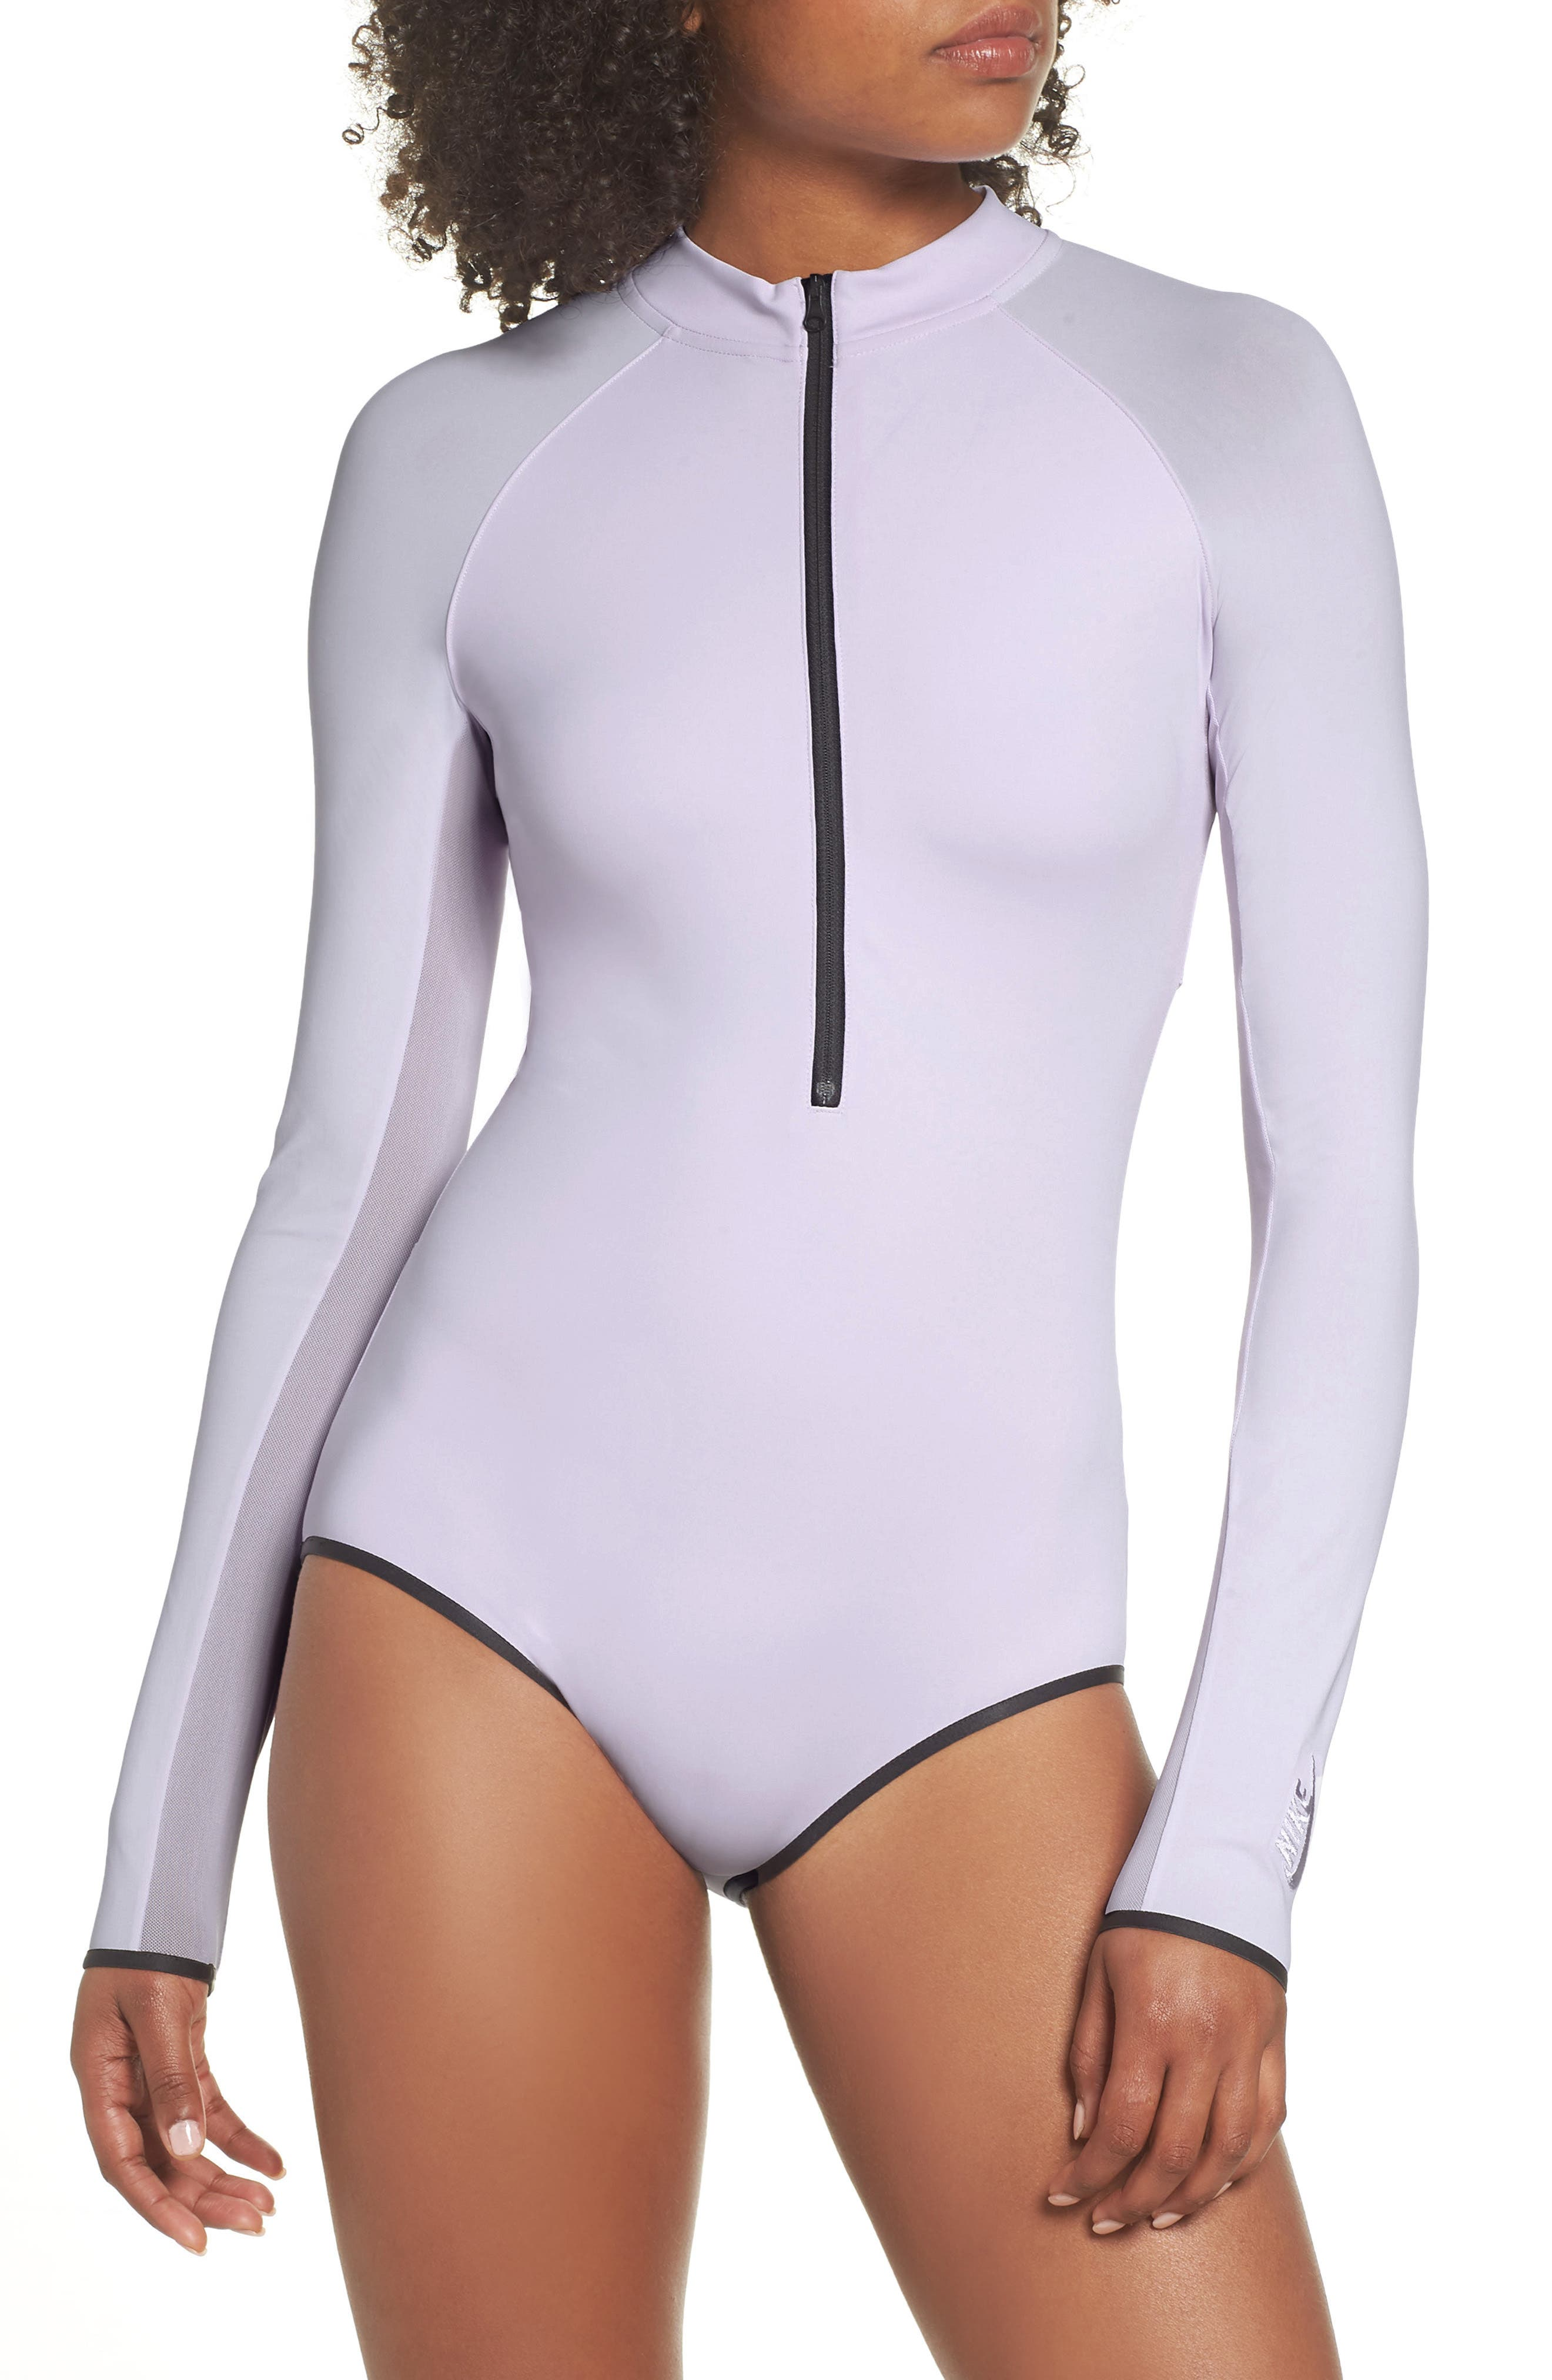 NRG Women's Dri-FIT Long Sleeve Bodysuit,                             Main thumbnail 1, color,                             Barely Grape/ Barely Grape